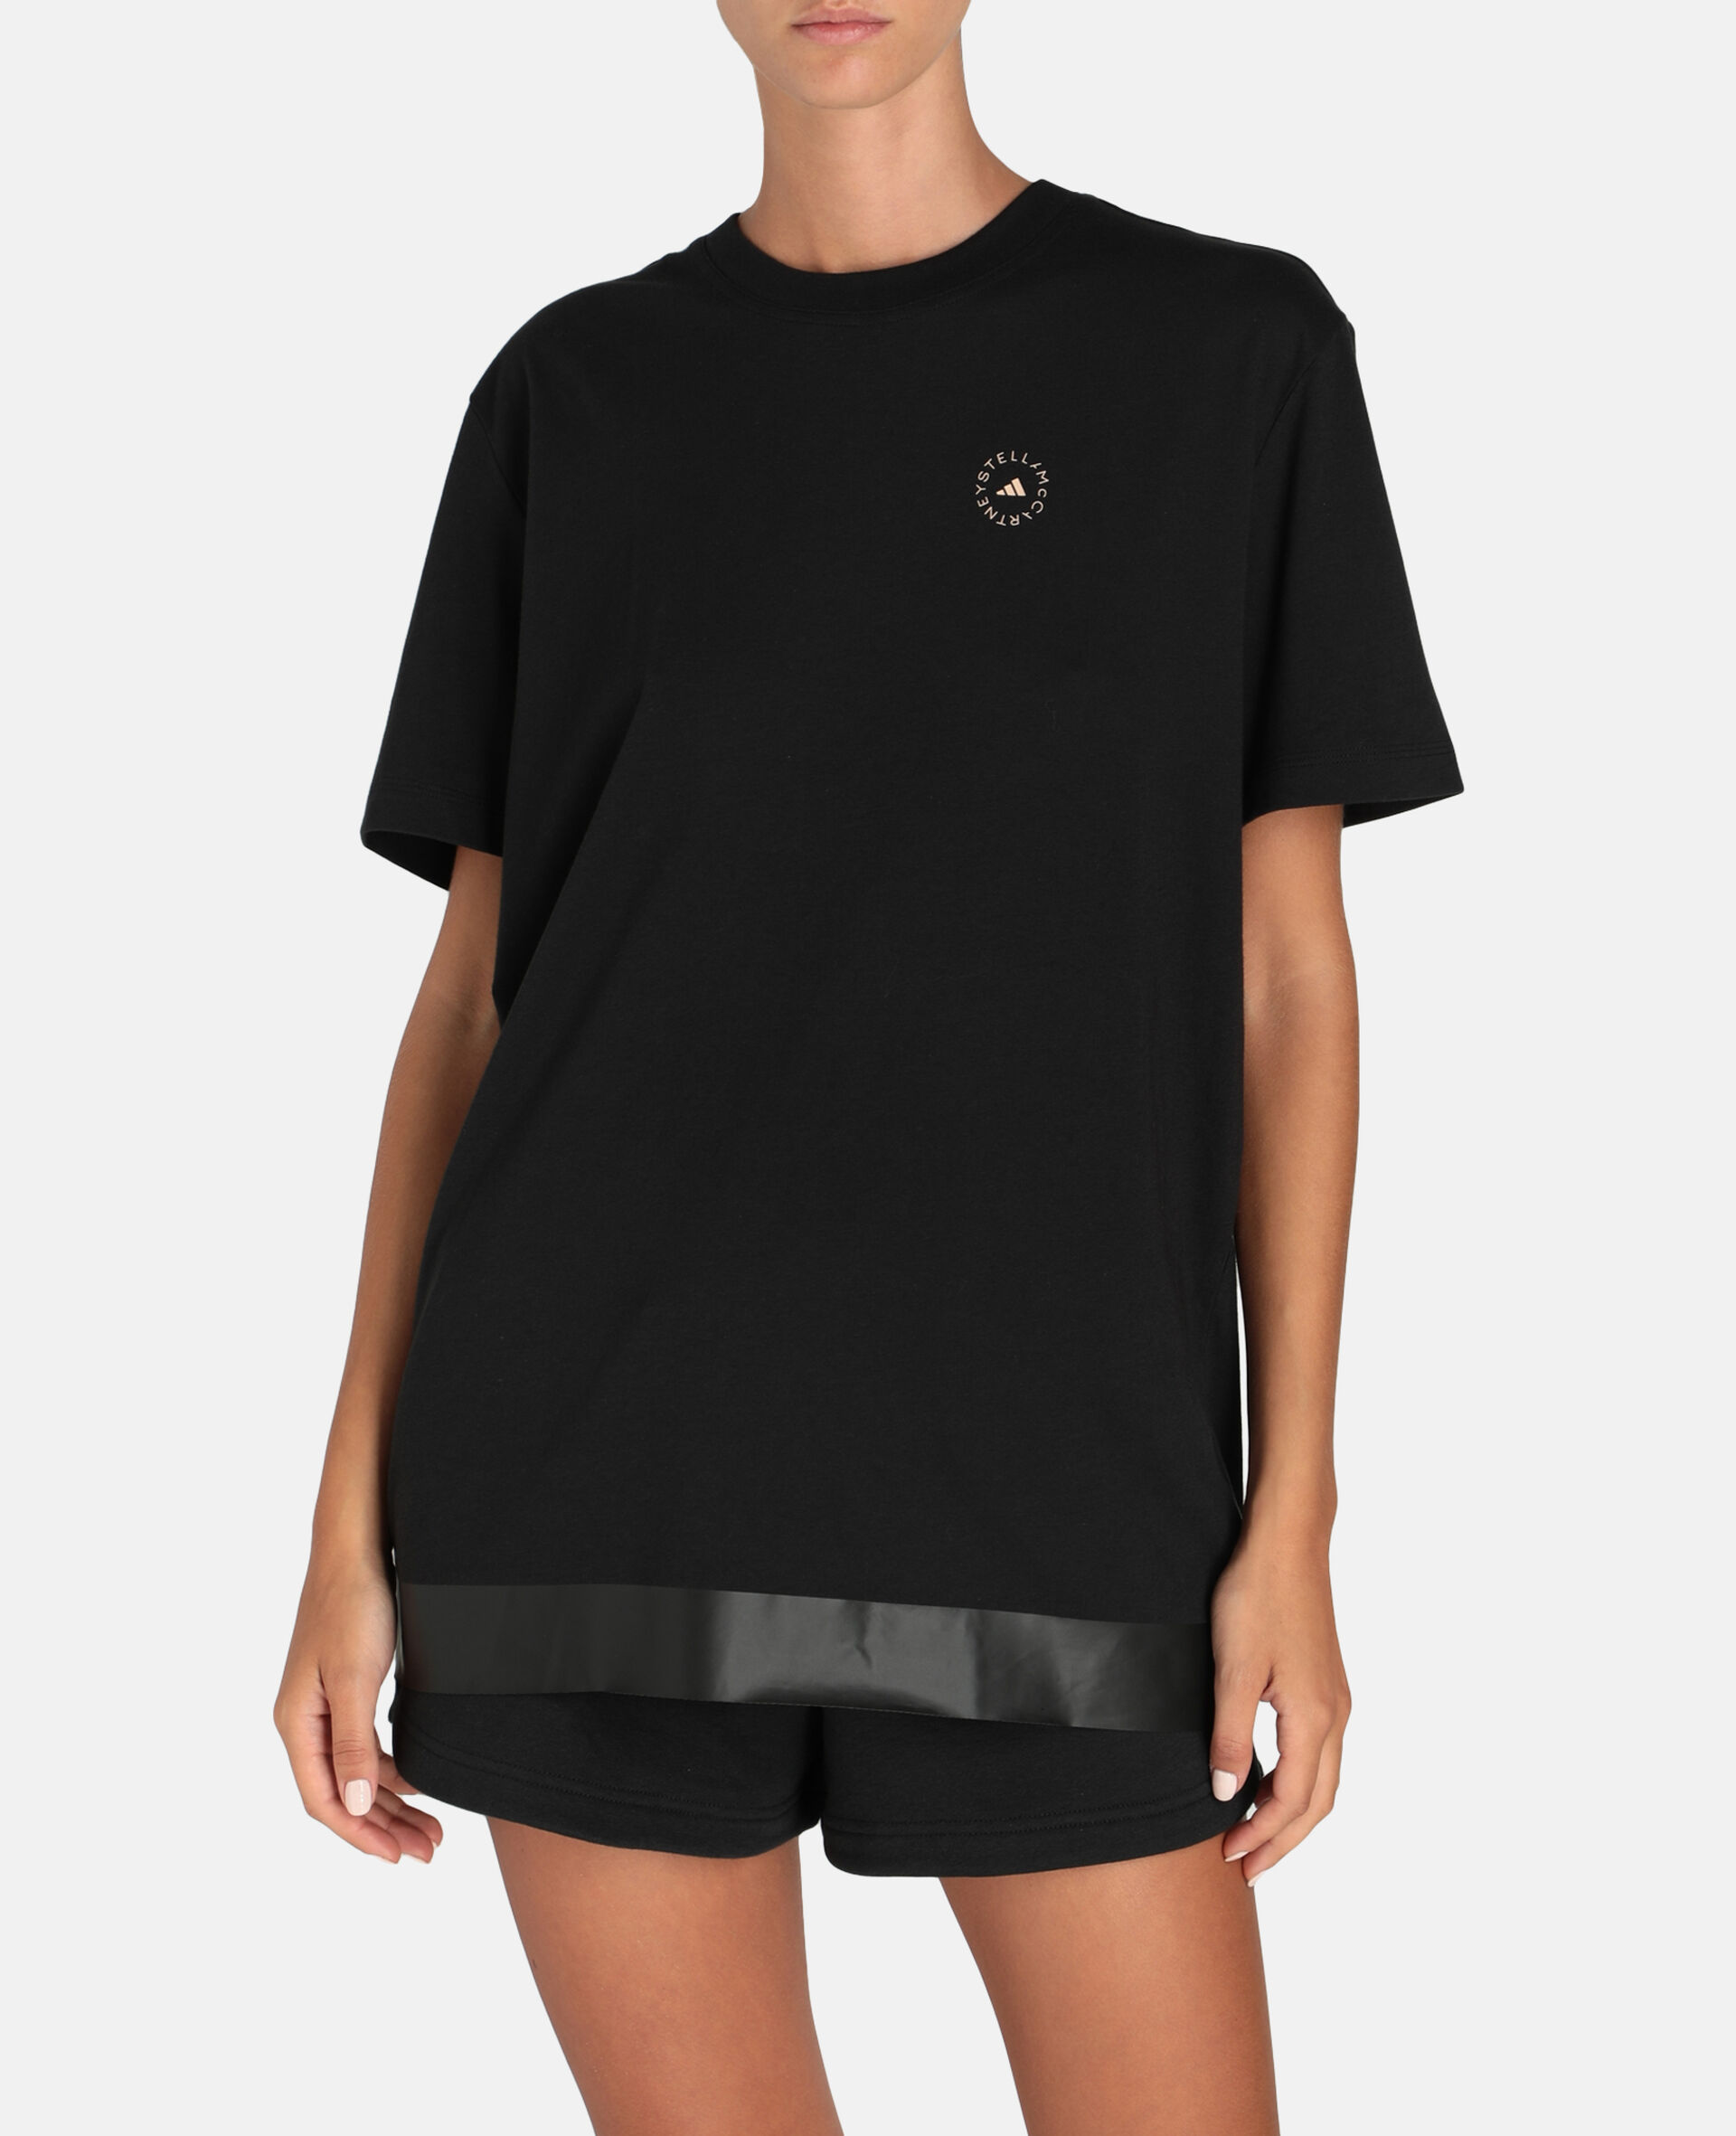 Black Training T-Shirt-Black-large image number 4